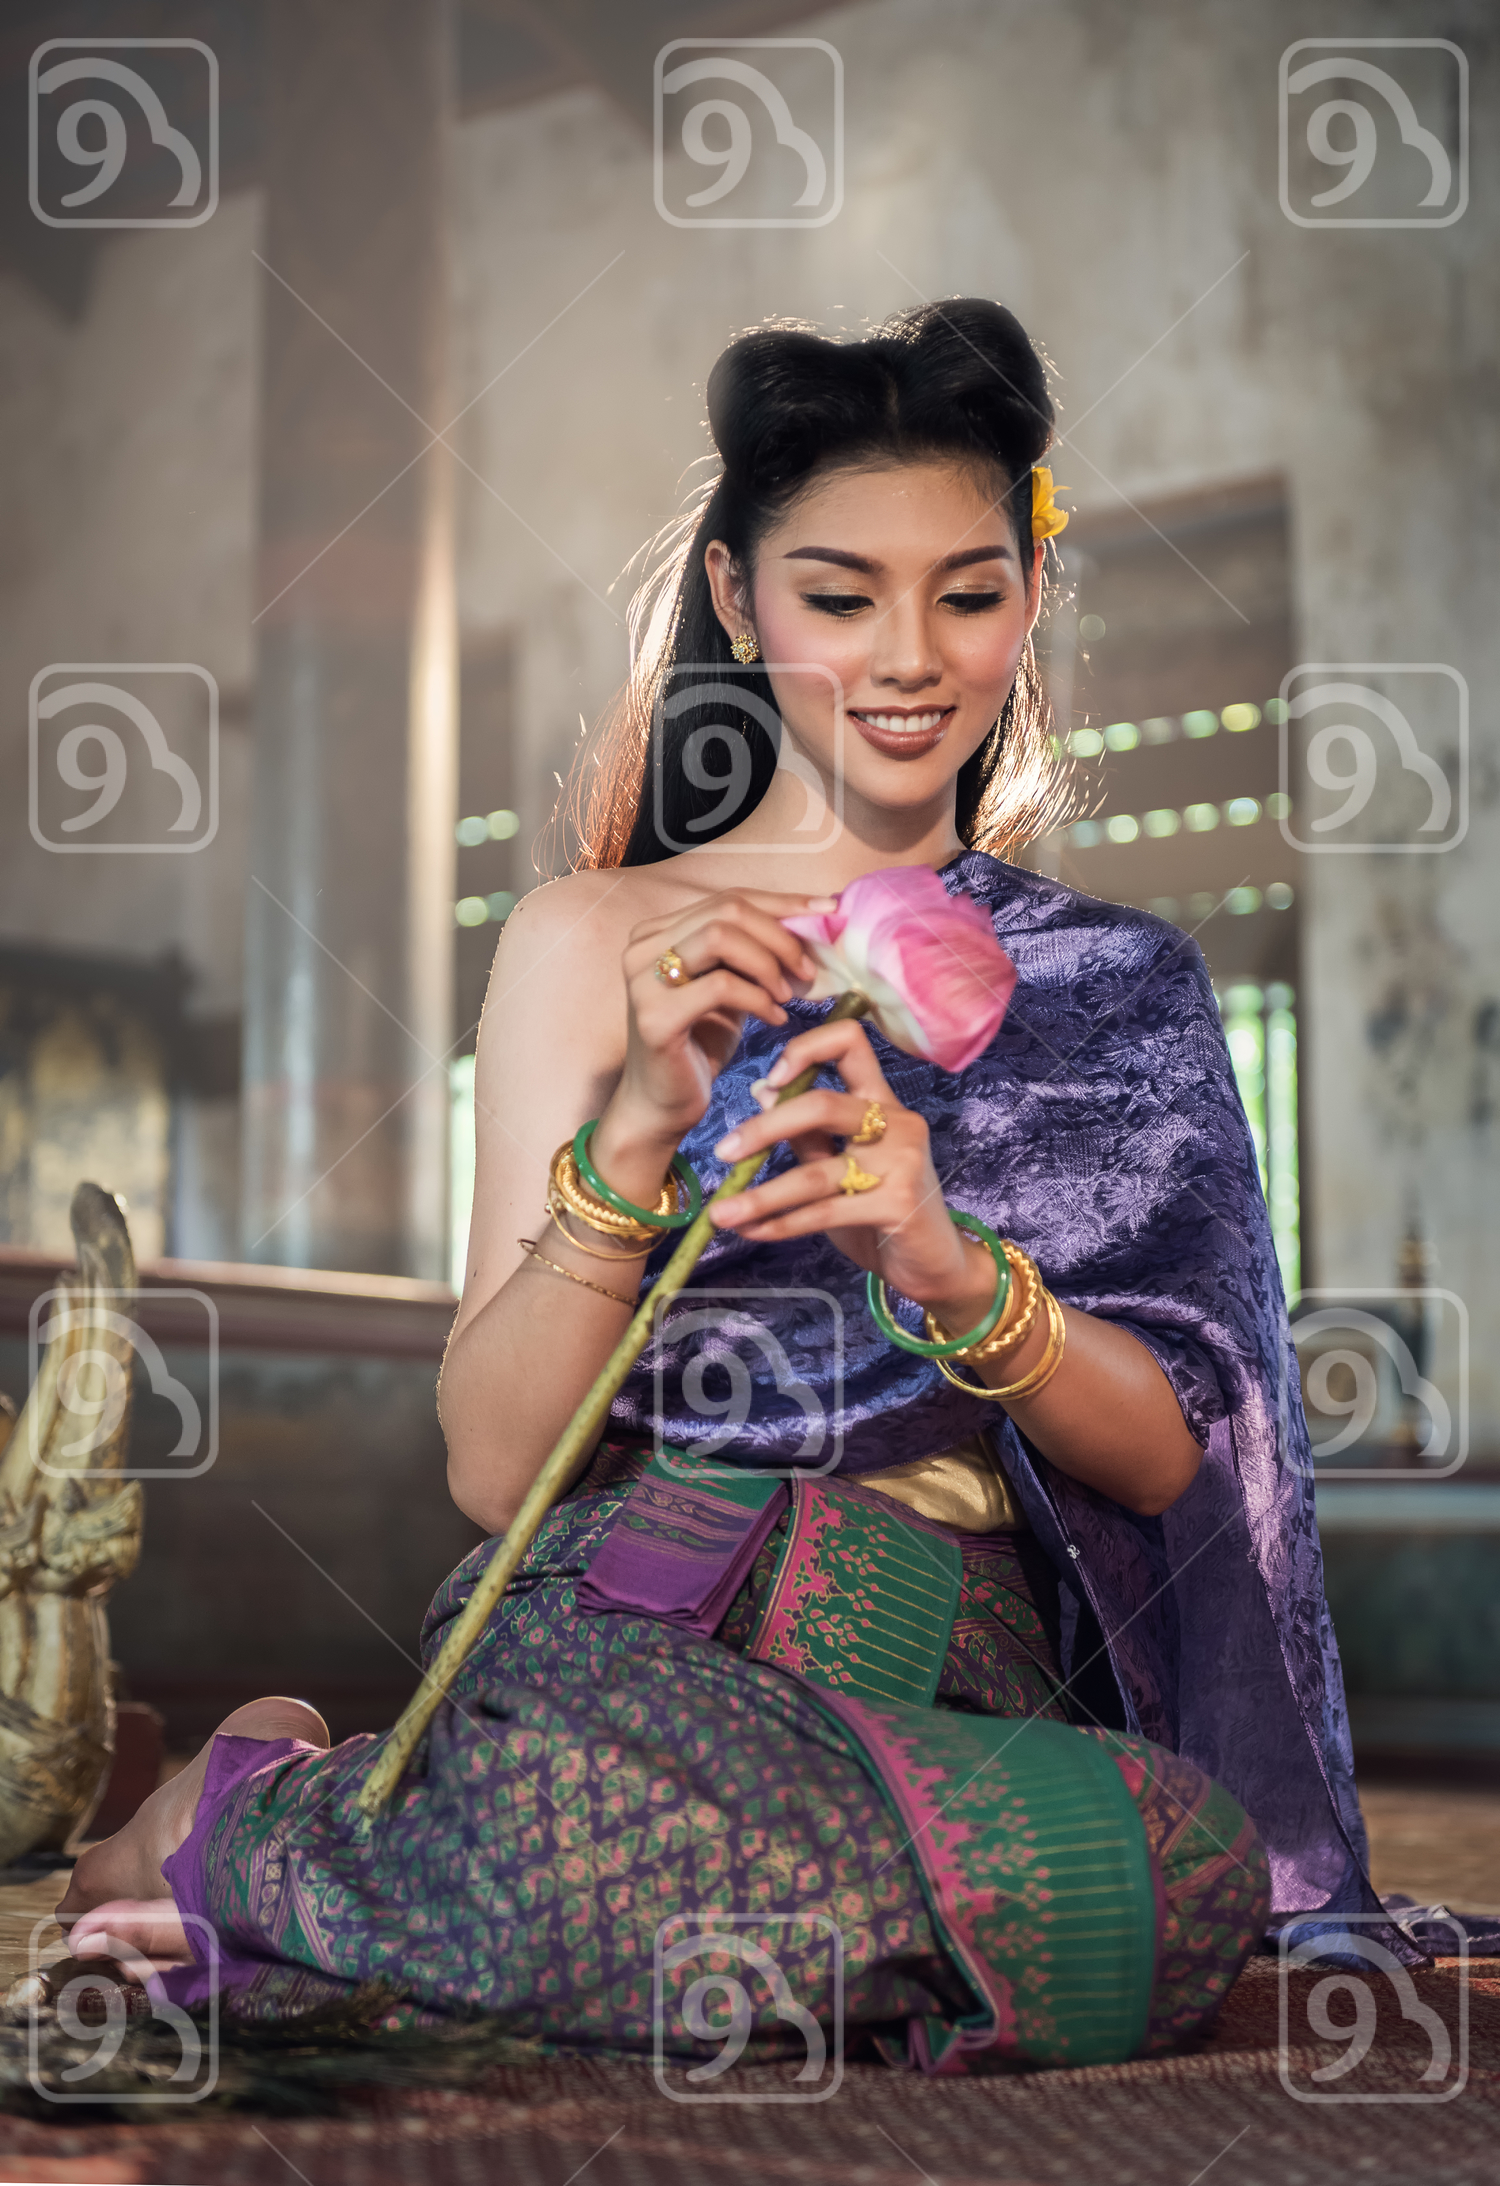 Thai girl making lotus flower in temple